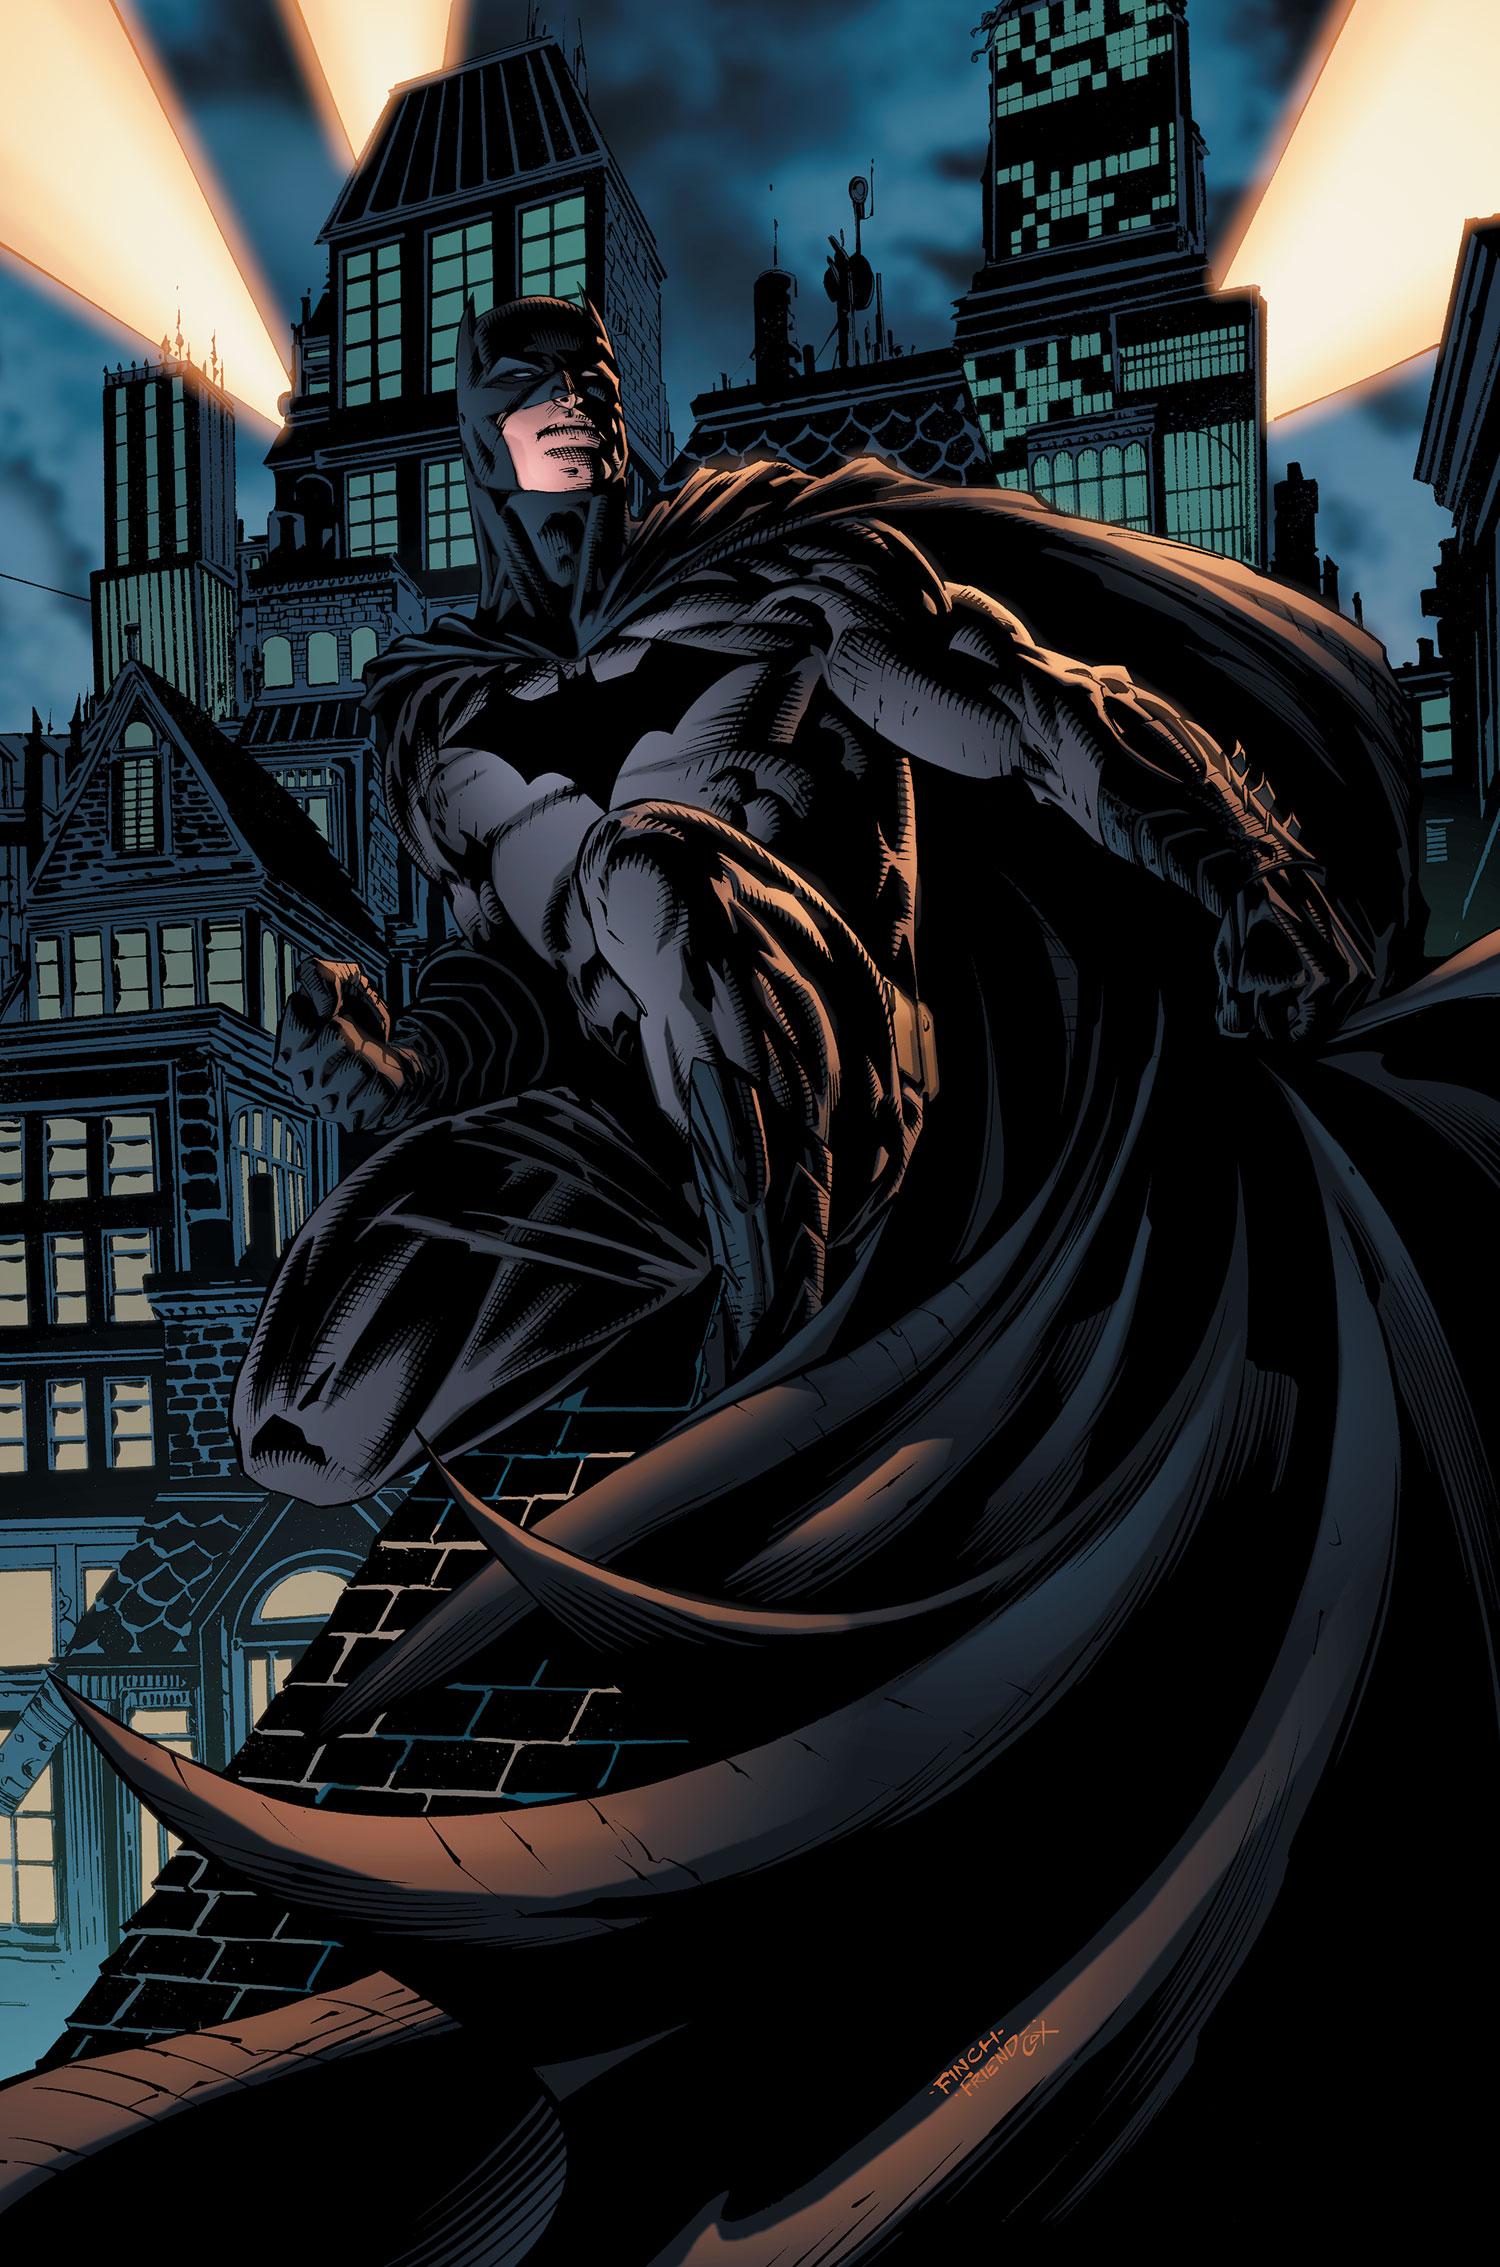 The Dark Knight from The Dark Knight Returns